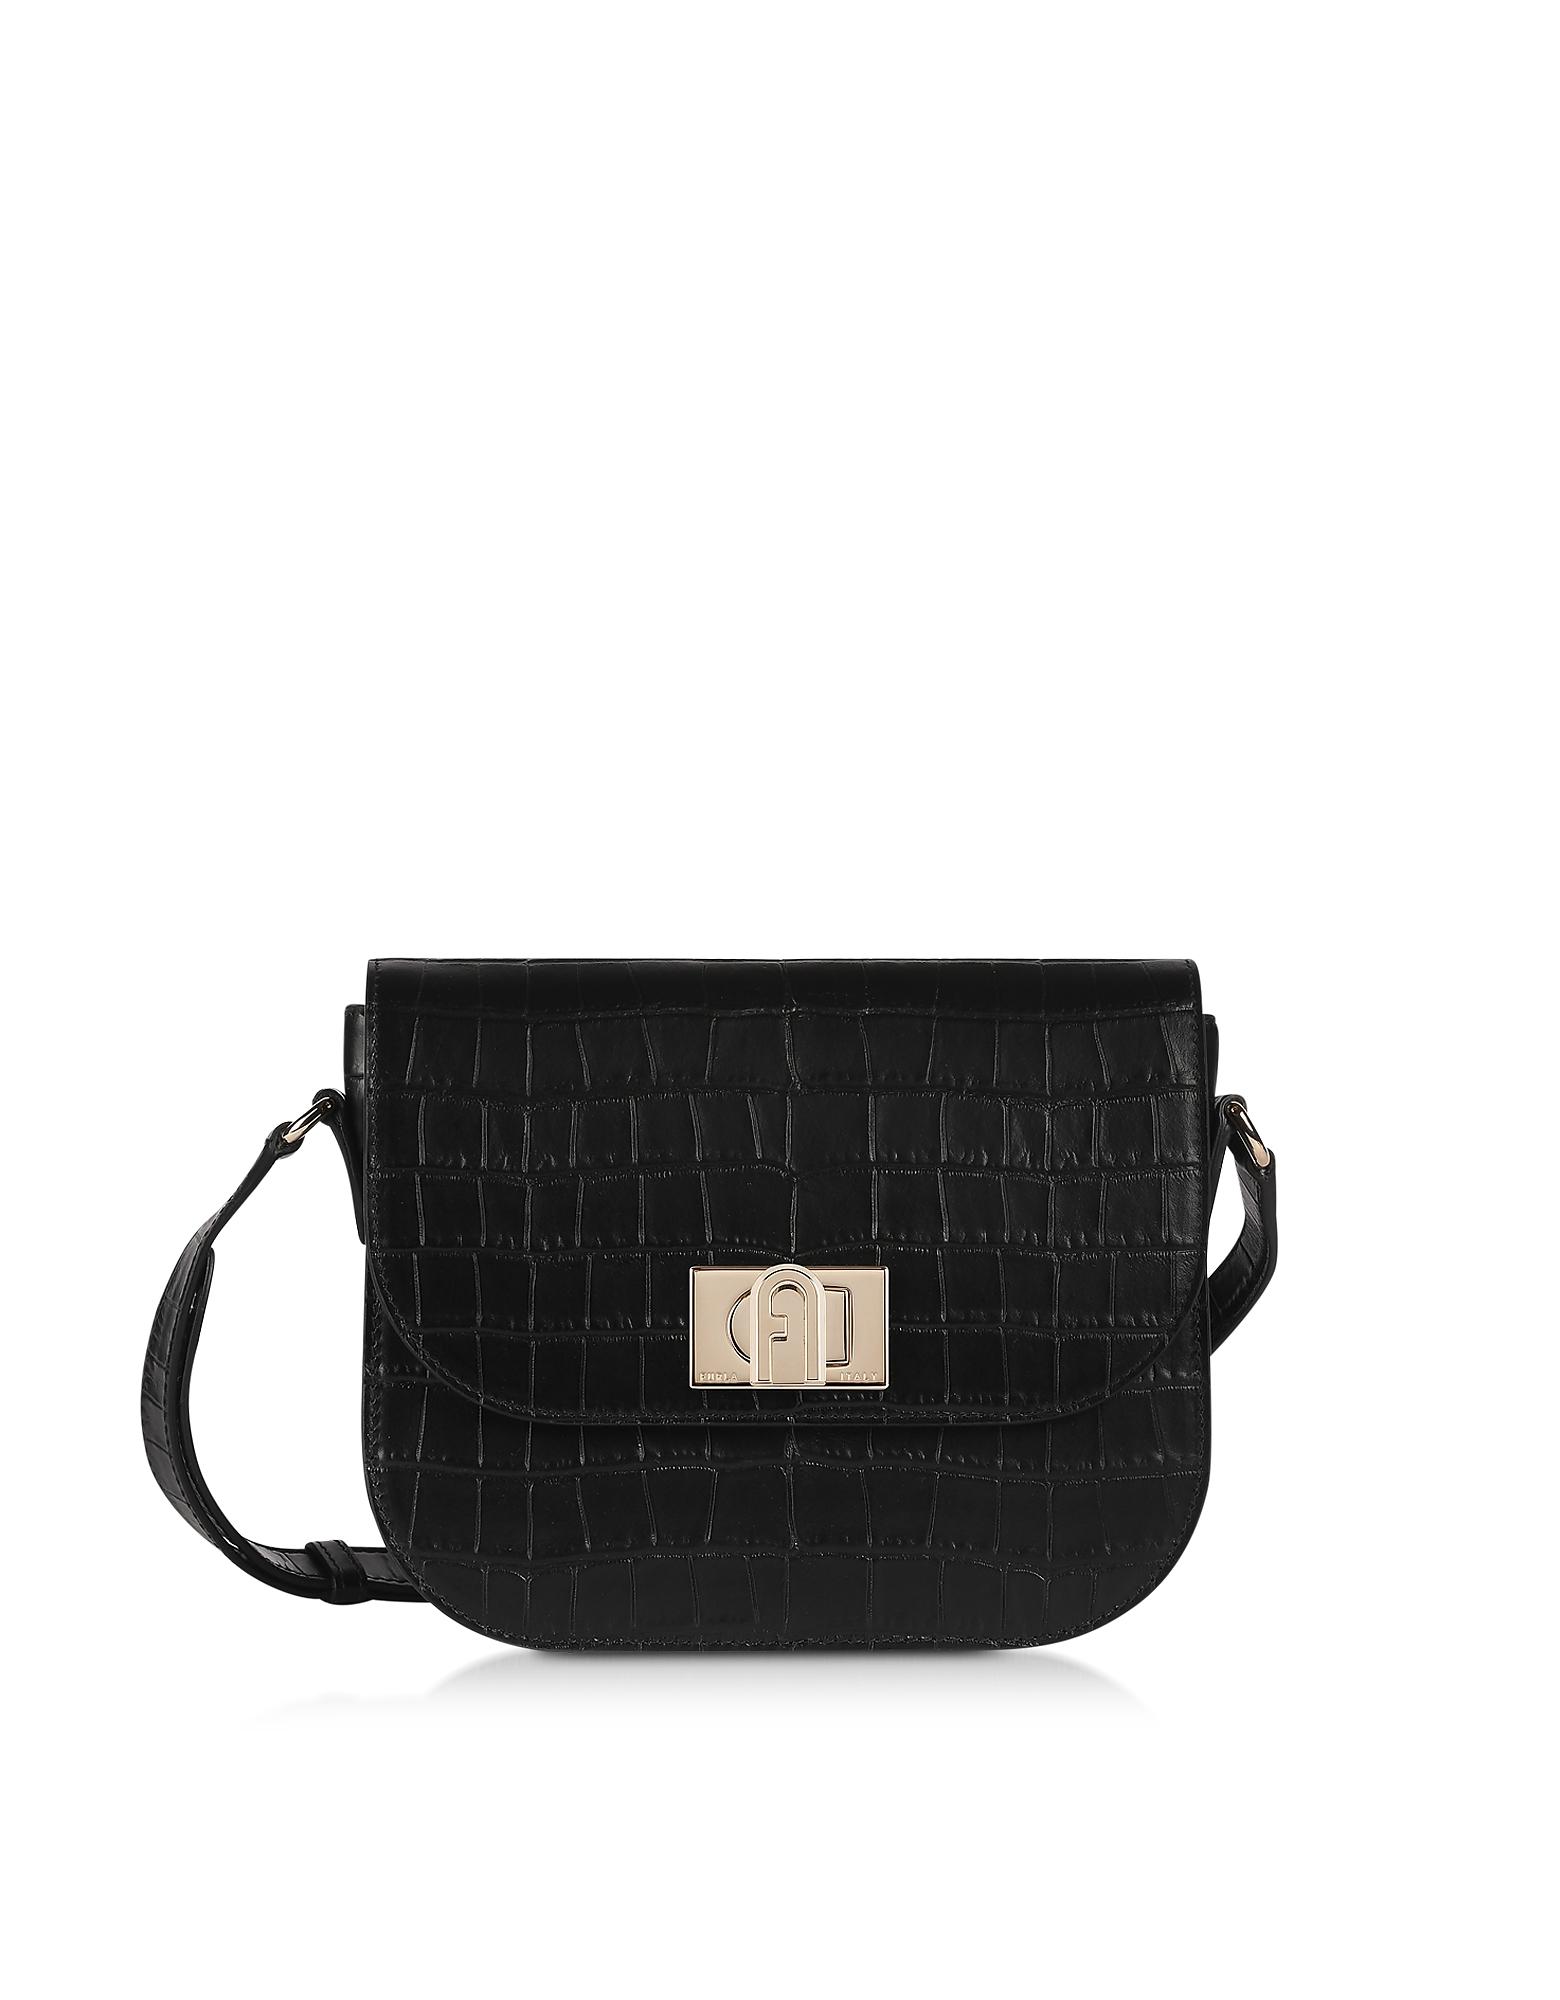 Furla Designer Handbags, Black Croco Embossed Leather 1927 S Crossbody Bag 23